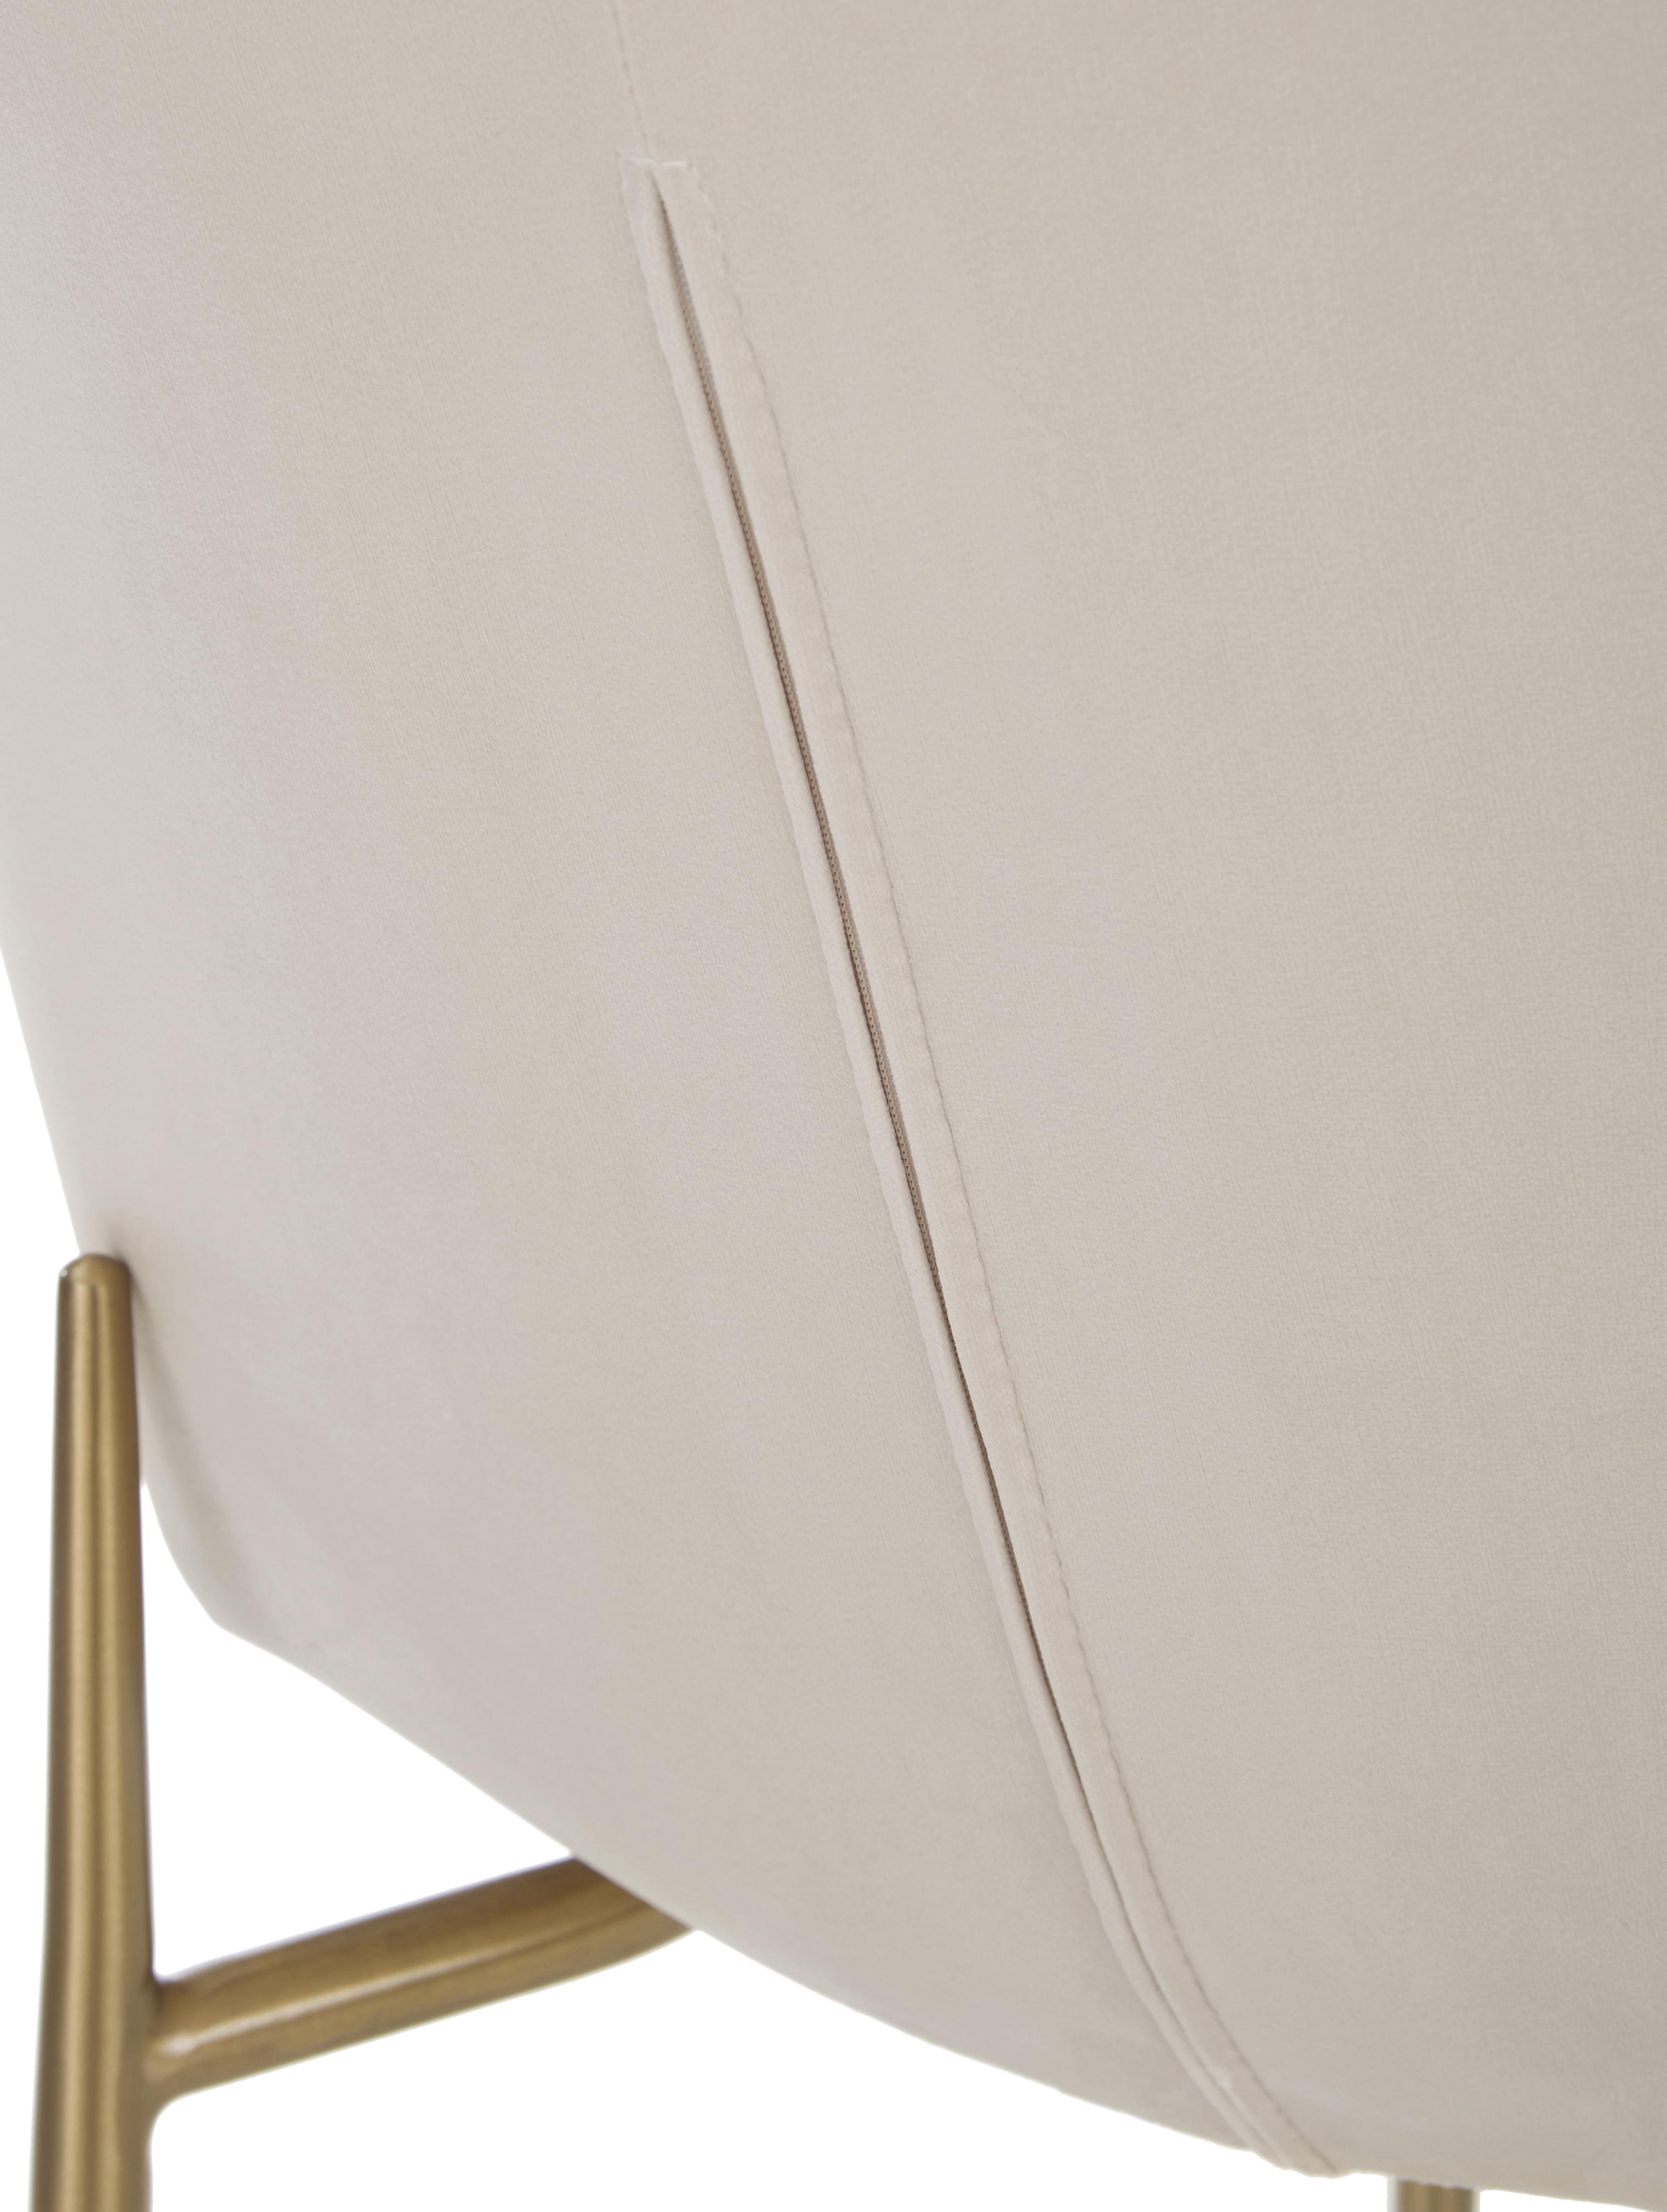 Silla de terciopelo Tess, Tapizado: terciopelo (poliéster) Al, Patas: metal recubierto, Terciopelo beige, patas oro, An 48 x Al 84 cm